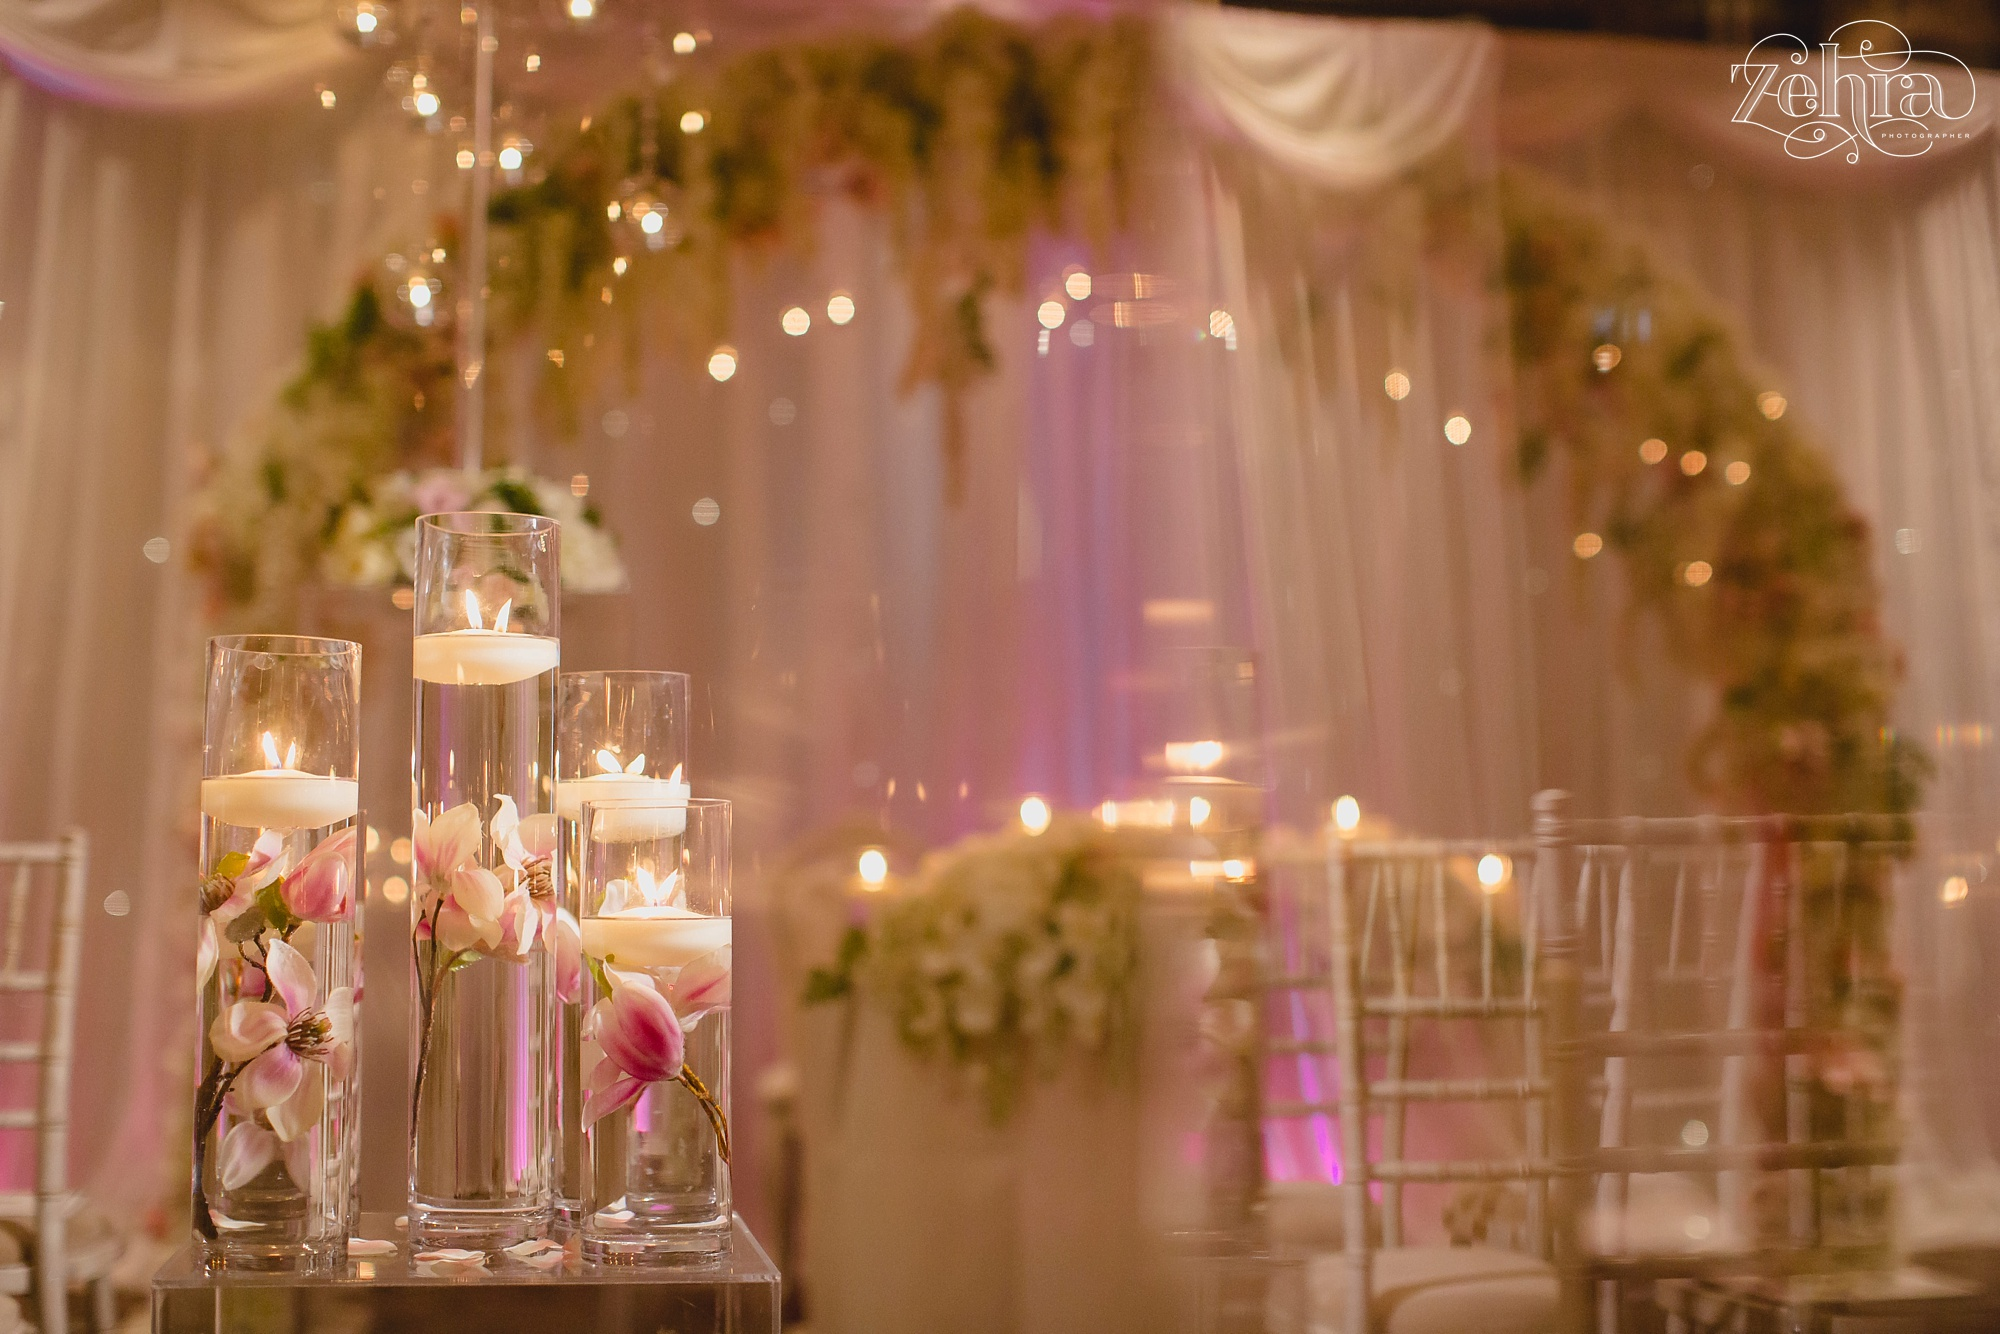 zehra photographer mere cheshire wedding_0009.jpg